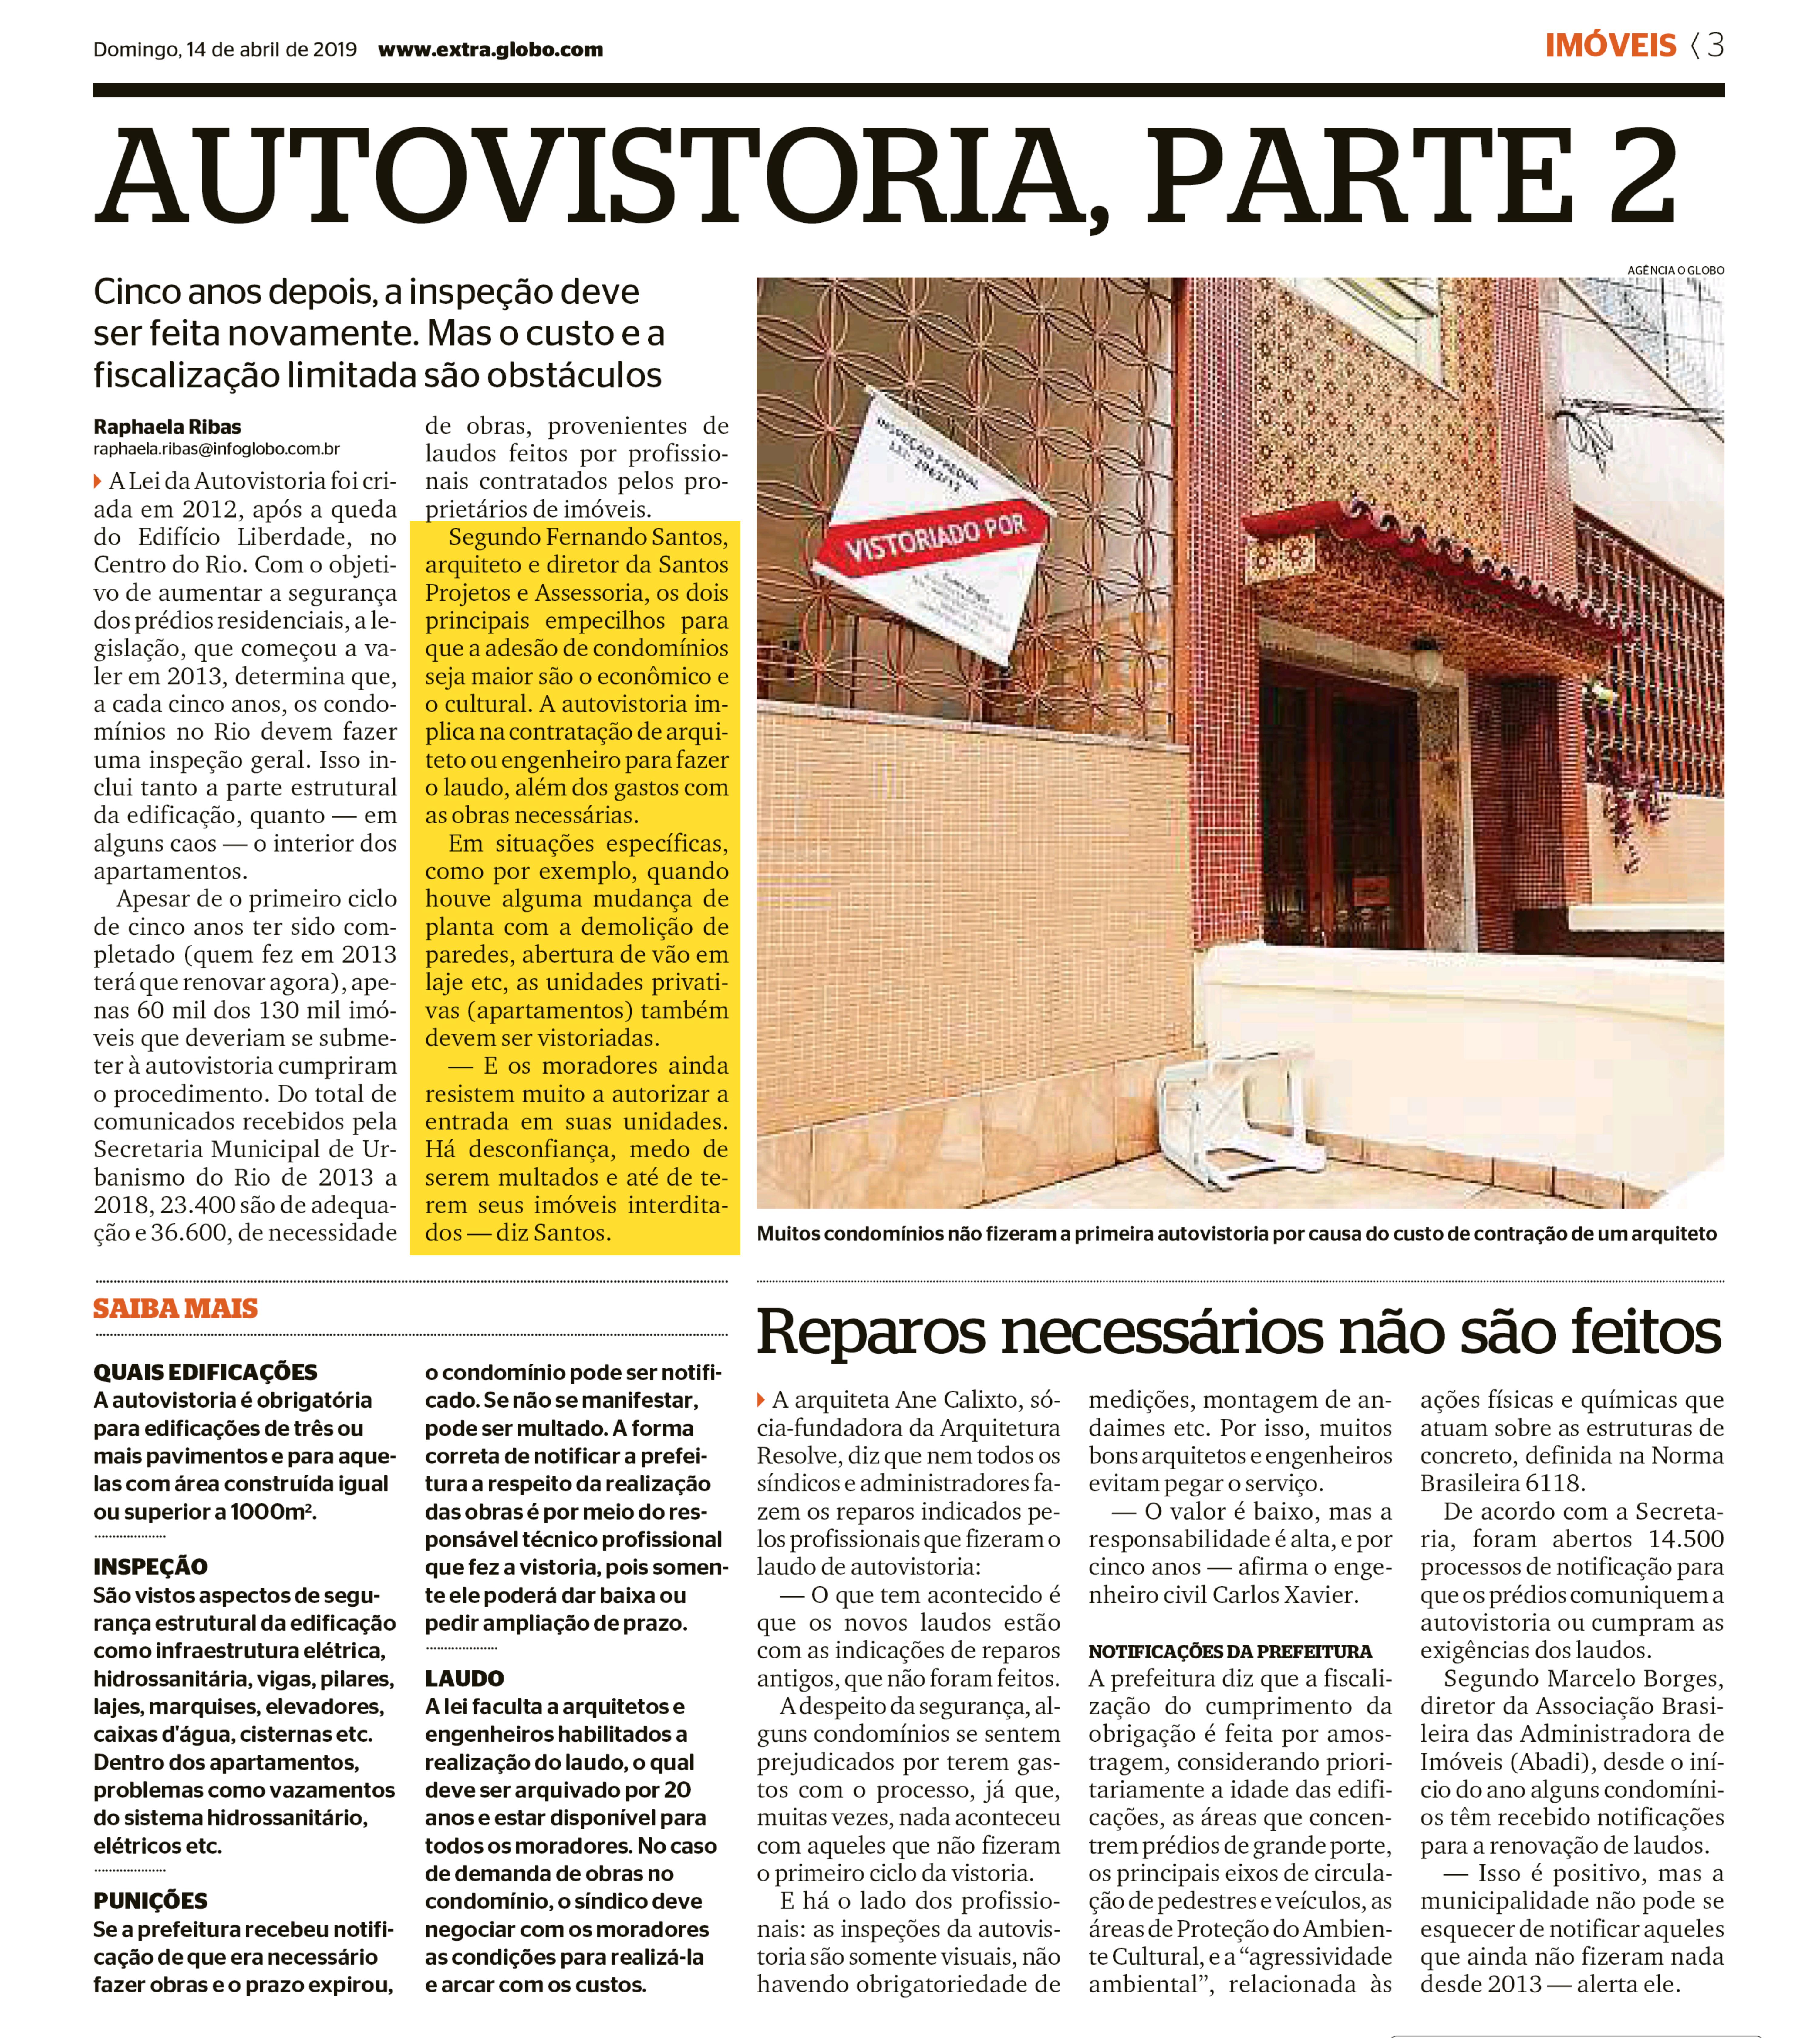 Jornal Extra – Autovistoria parte 2